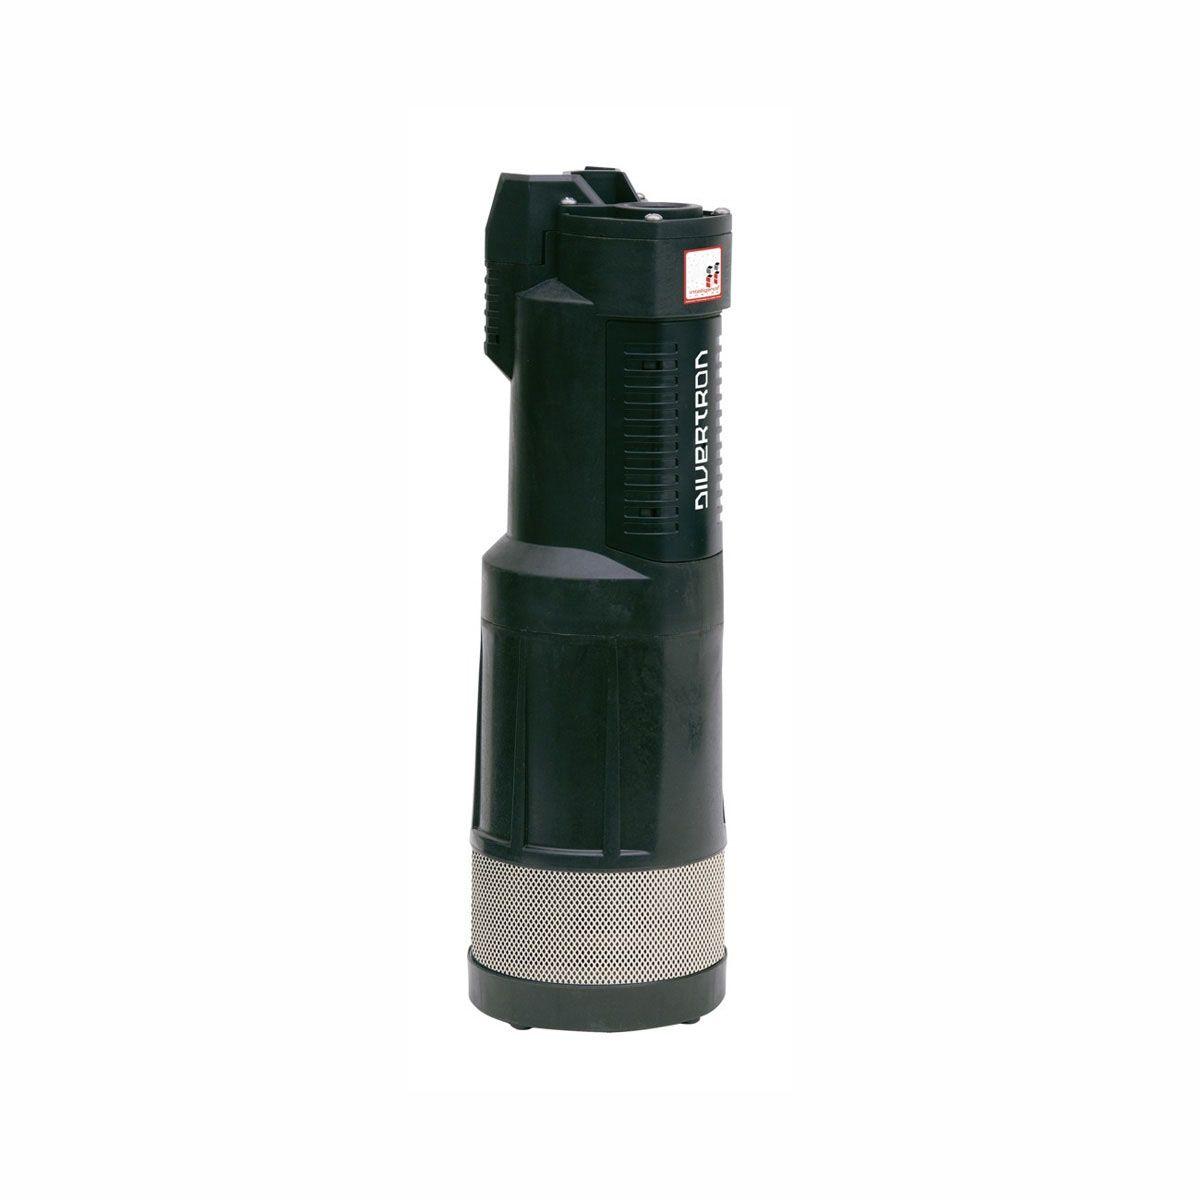 Tauchdruckpumpe Fapatron 46, H max 46 m, Q max 6500 l/h, 1.10 kW, 150 x 150 x 480 mm, 1' IG, 230 V